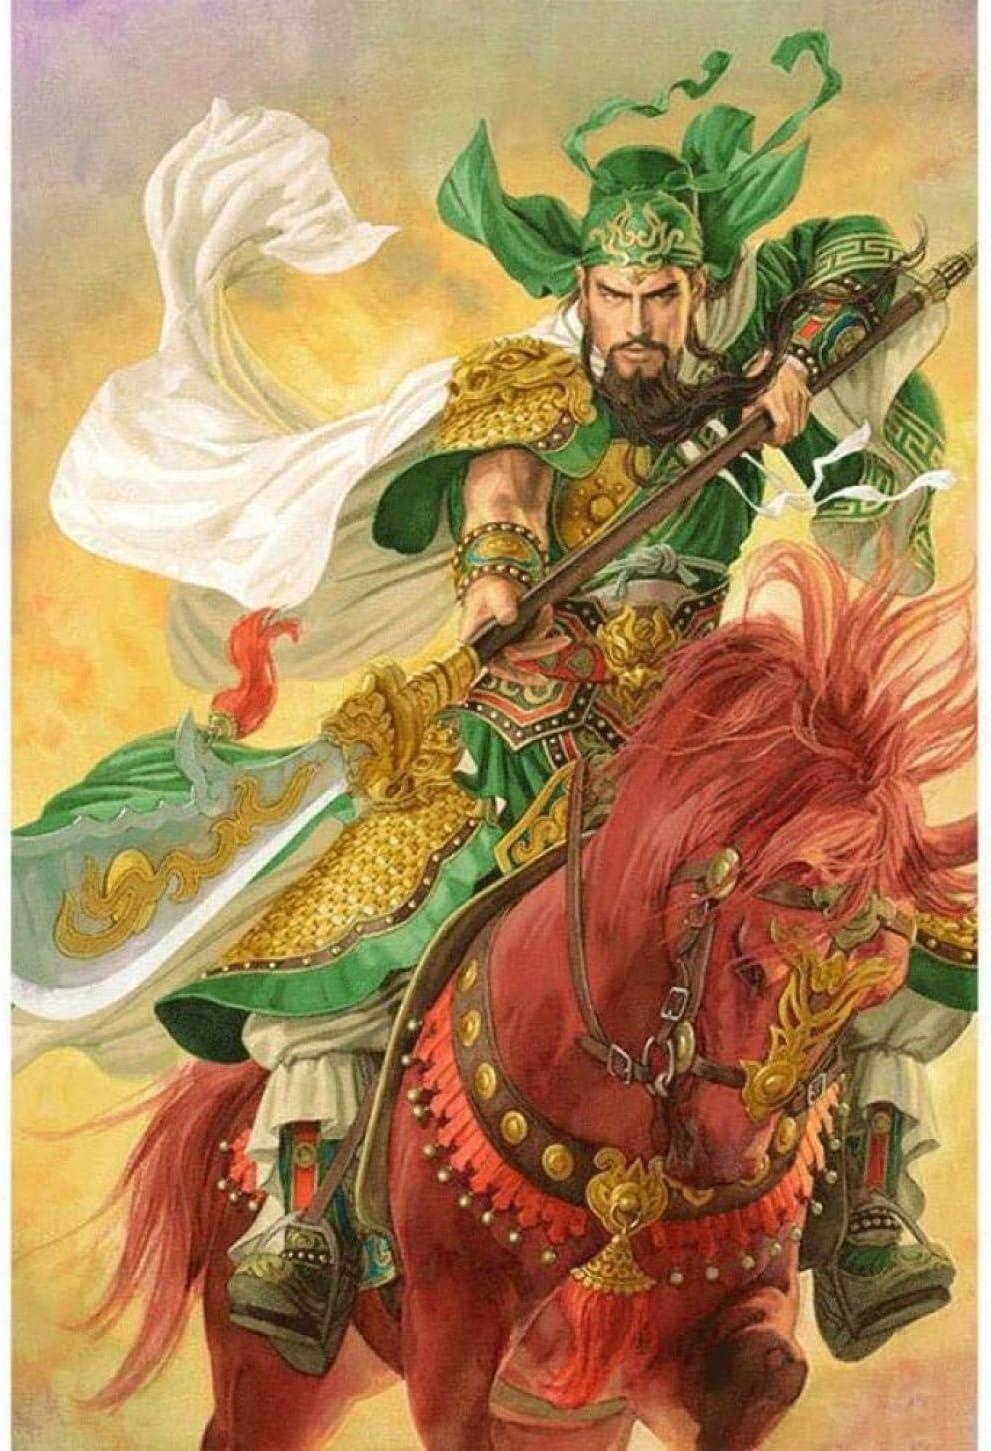 YYTTLL Diy 5D Kits de pintura de diamantes para adultos Niños Guan Yu Montar un caballo Taladro completo Mosaico Bordado redondo Kits de punto de cruz Artesanía Gift-40X50Cm